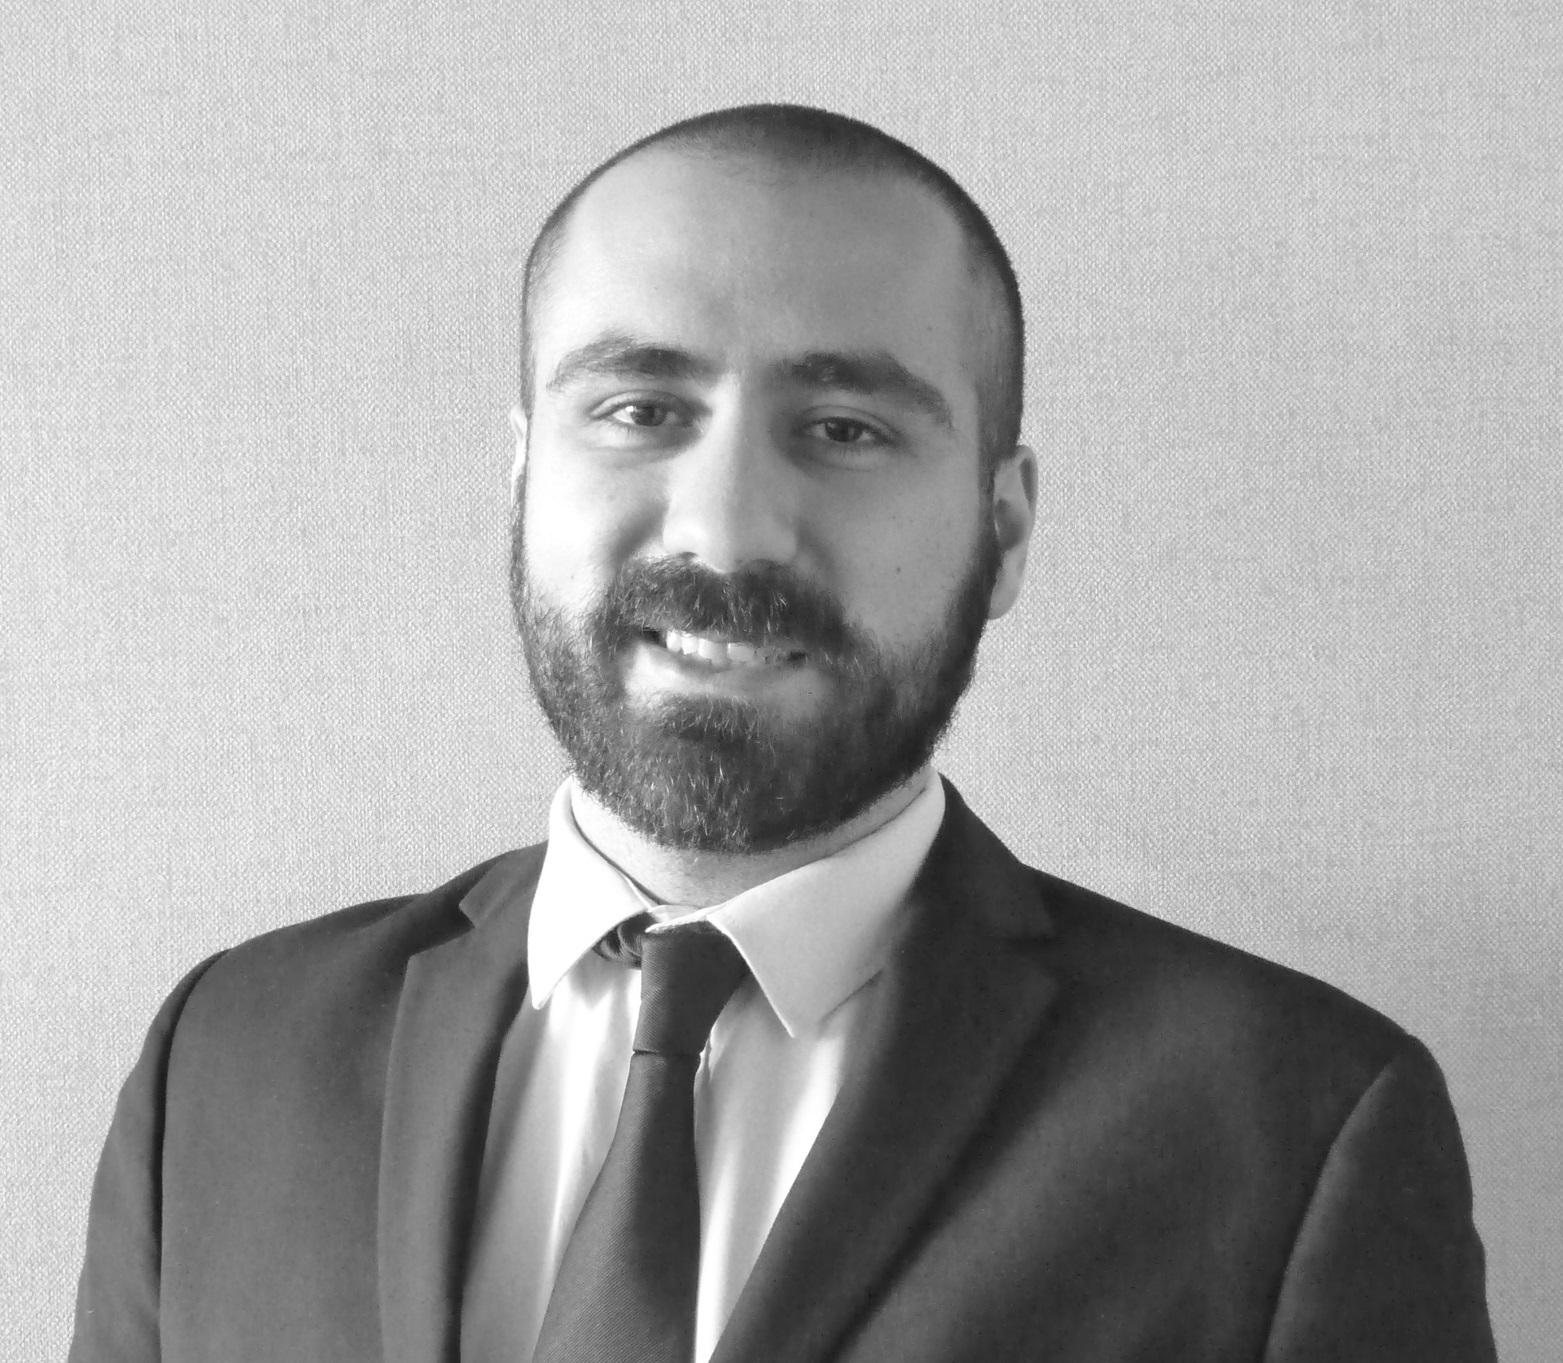 Ammar Bustami